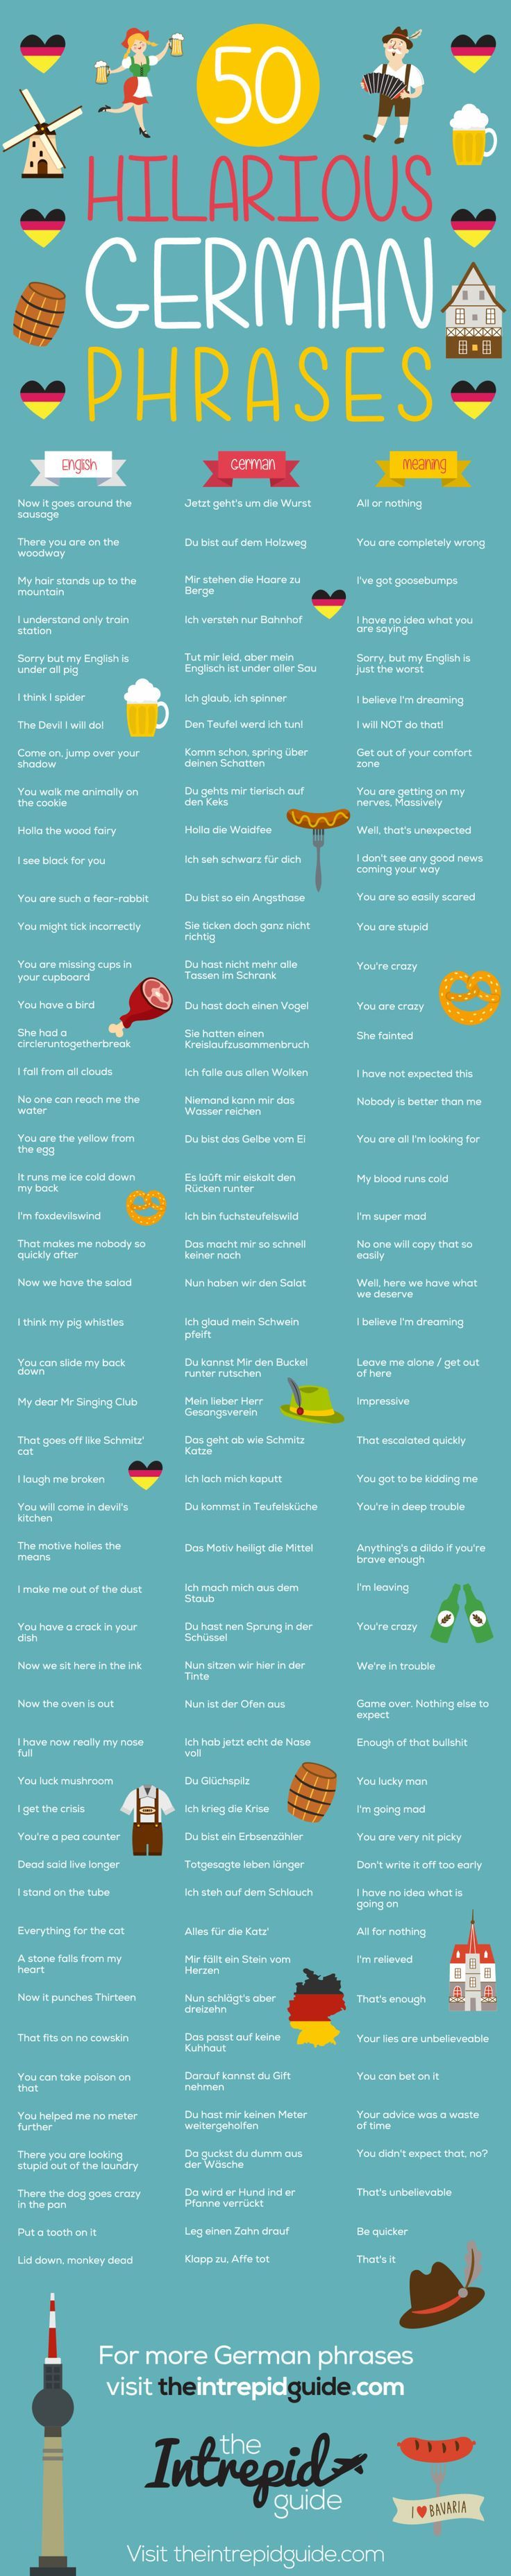 50 Amusing German Phrases That Will Brighten Your Day – anna